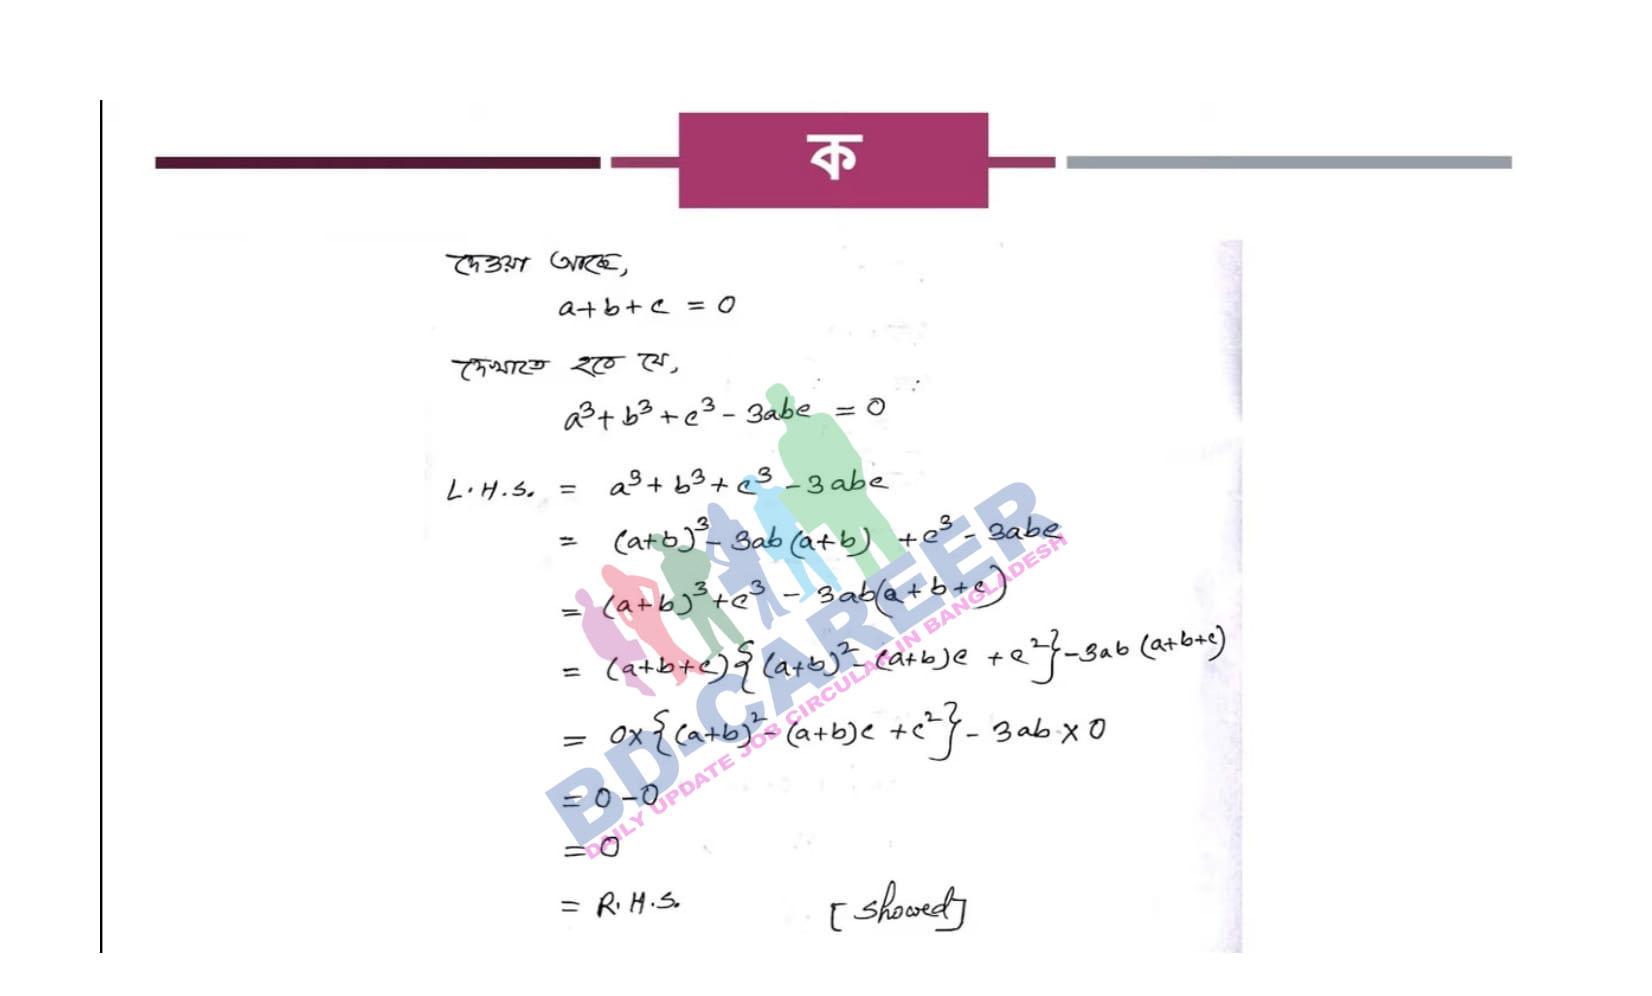 assigment-4th-class-9-math-answer-2020-21